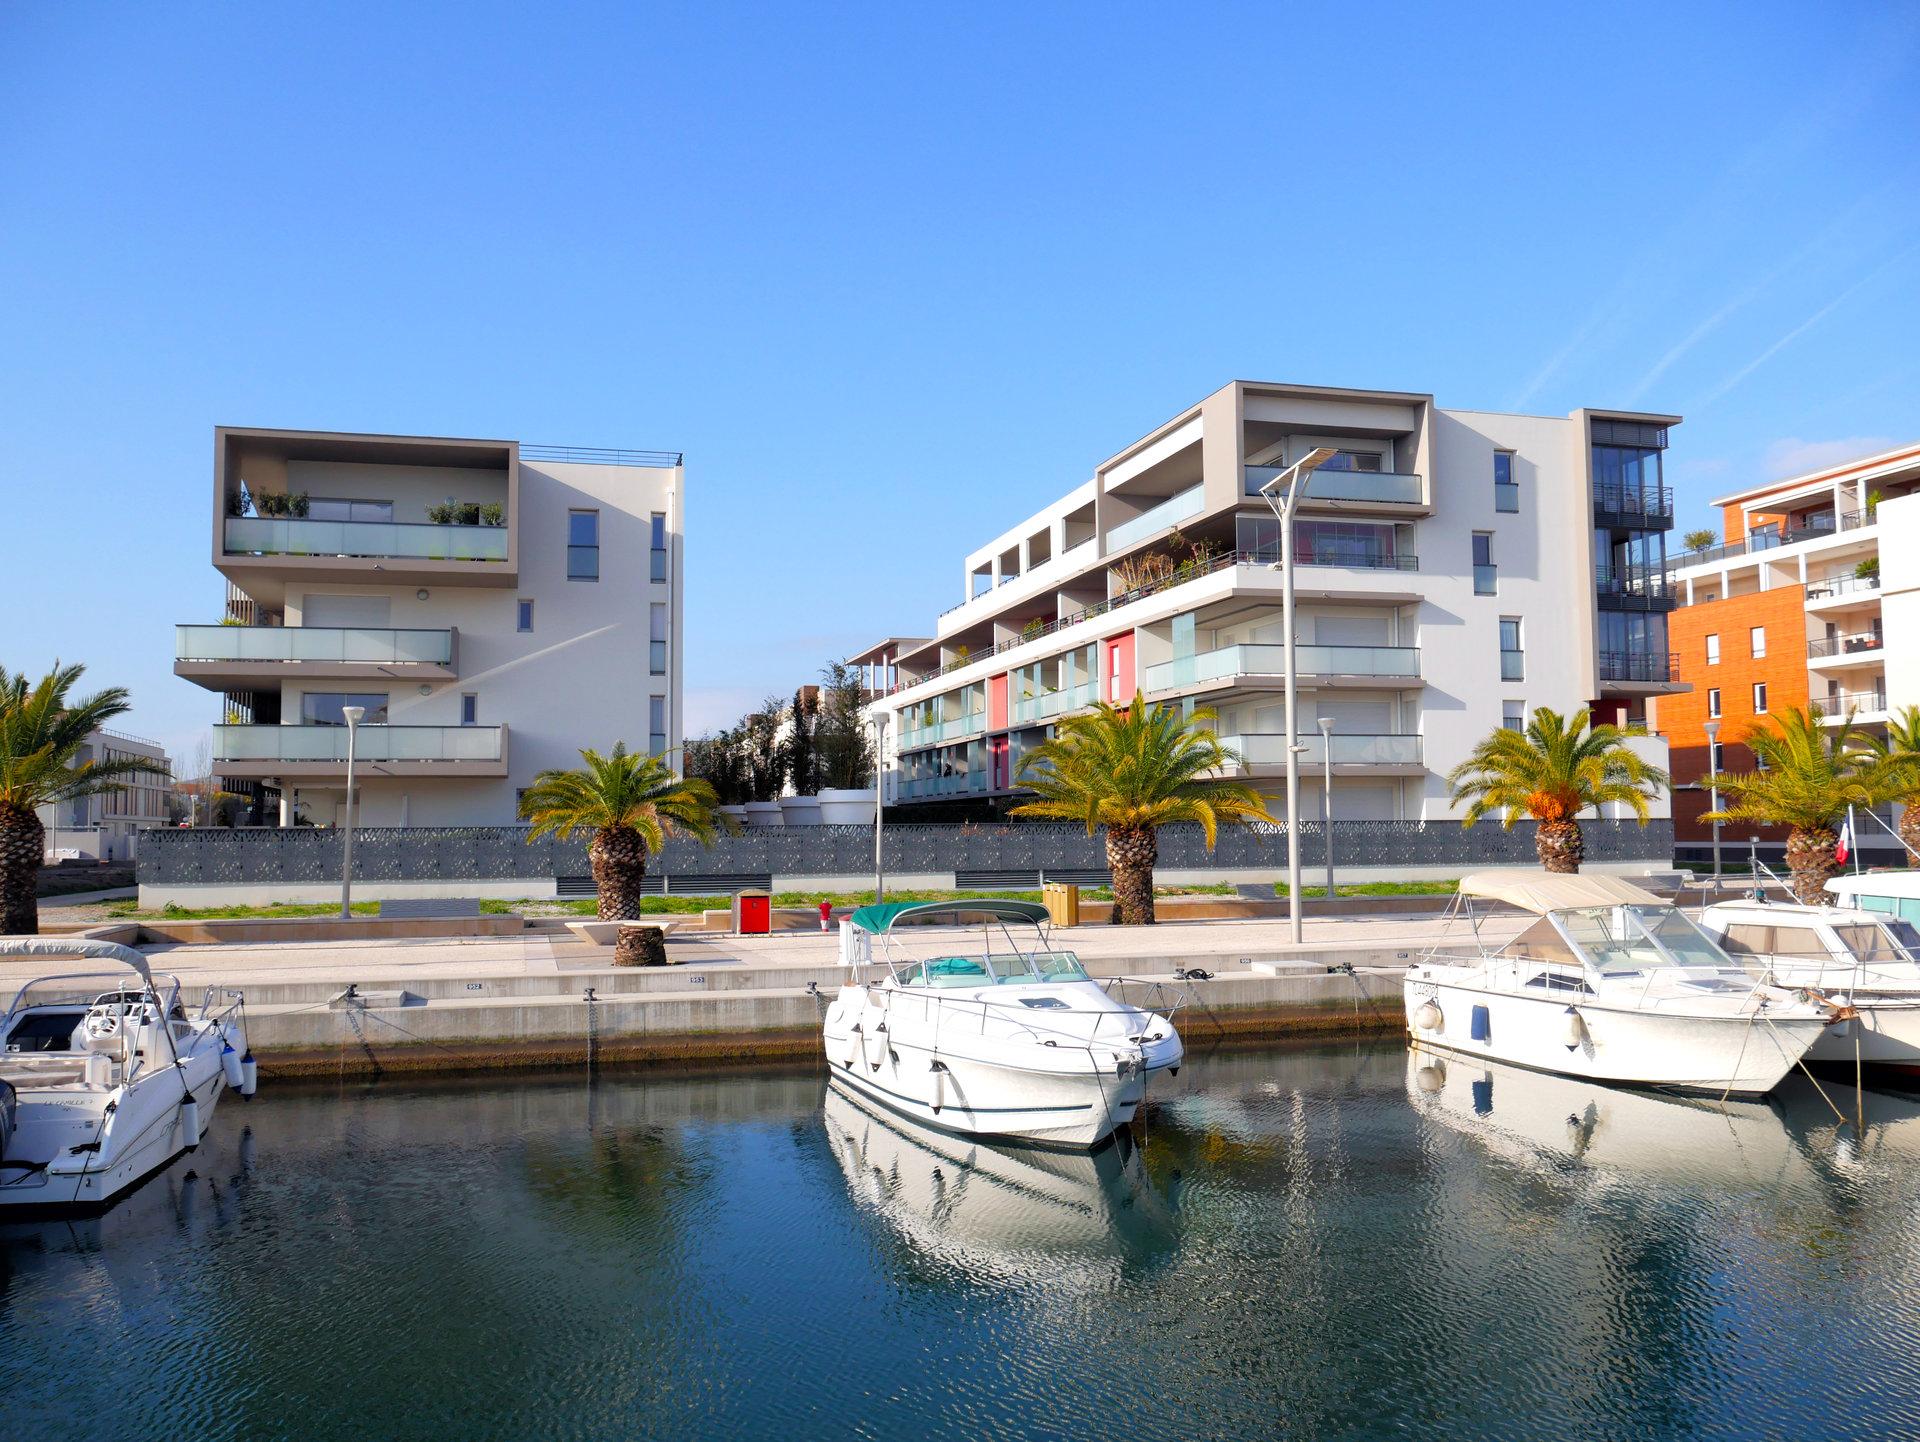 Superbe F3 avec garage, port Fréjus II